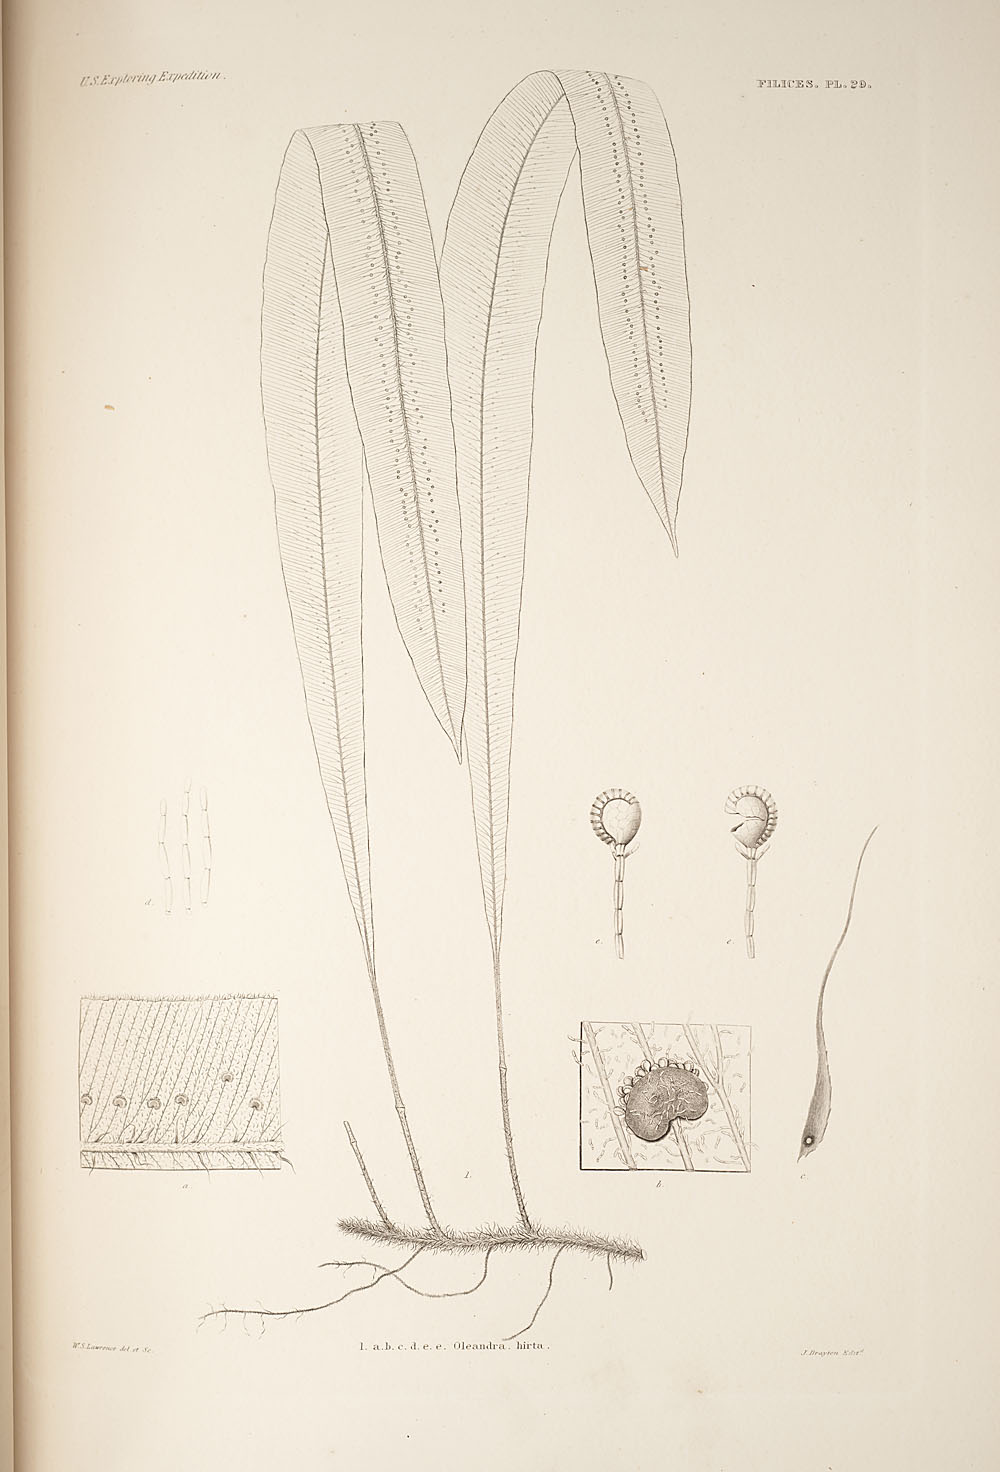 Fig. 1. Oleandra hirta,  Image number:SIL19-24a-041